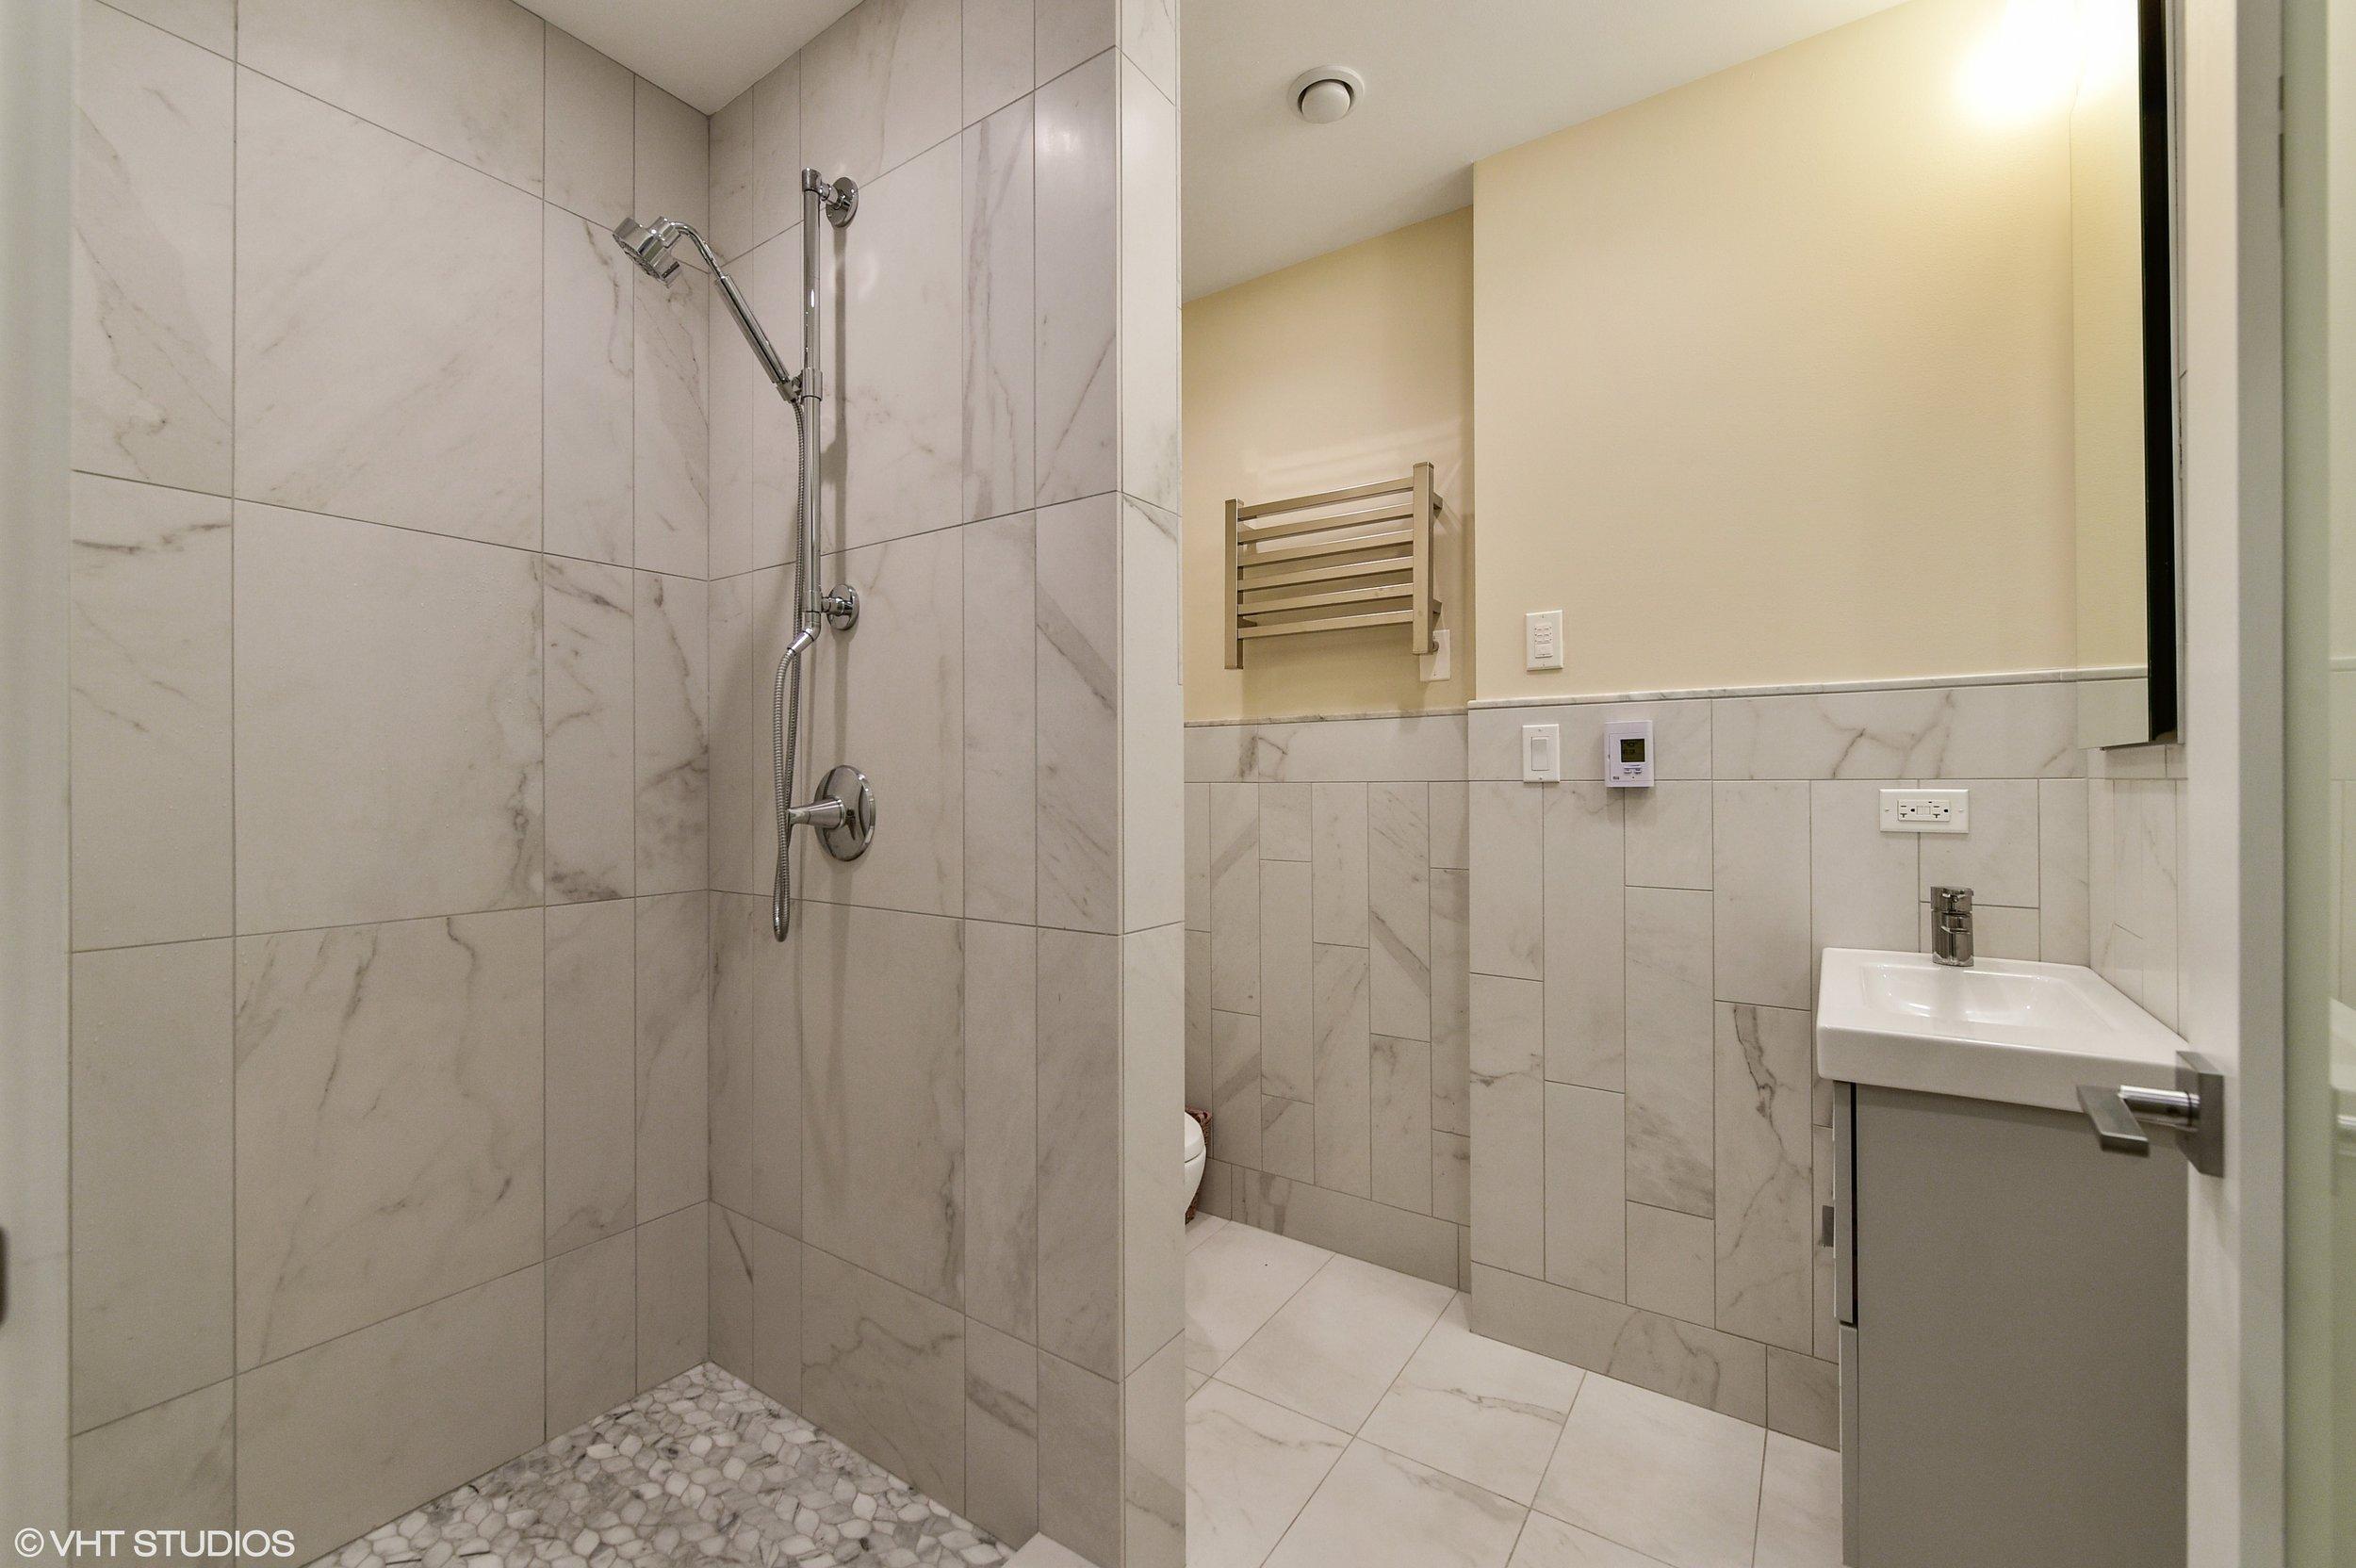 13_5485SEllisAve_8002_Bathroom_HiRes.jpg